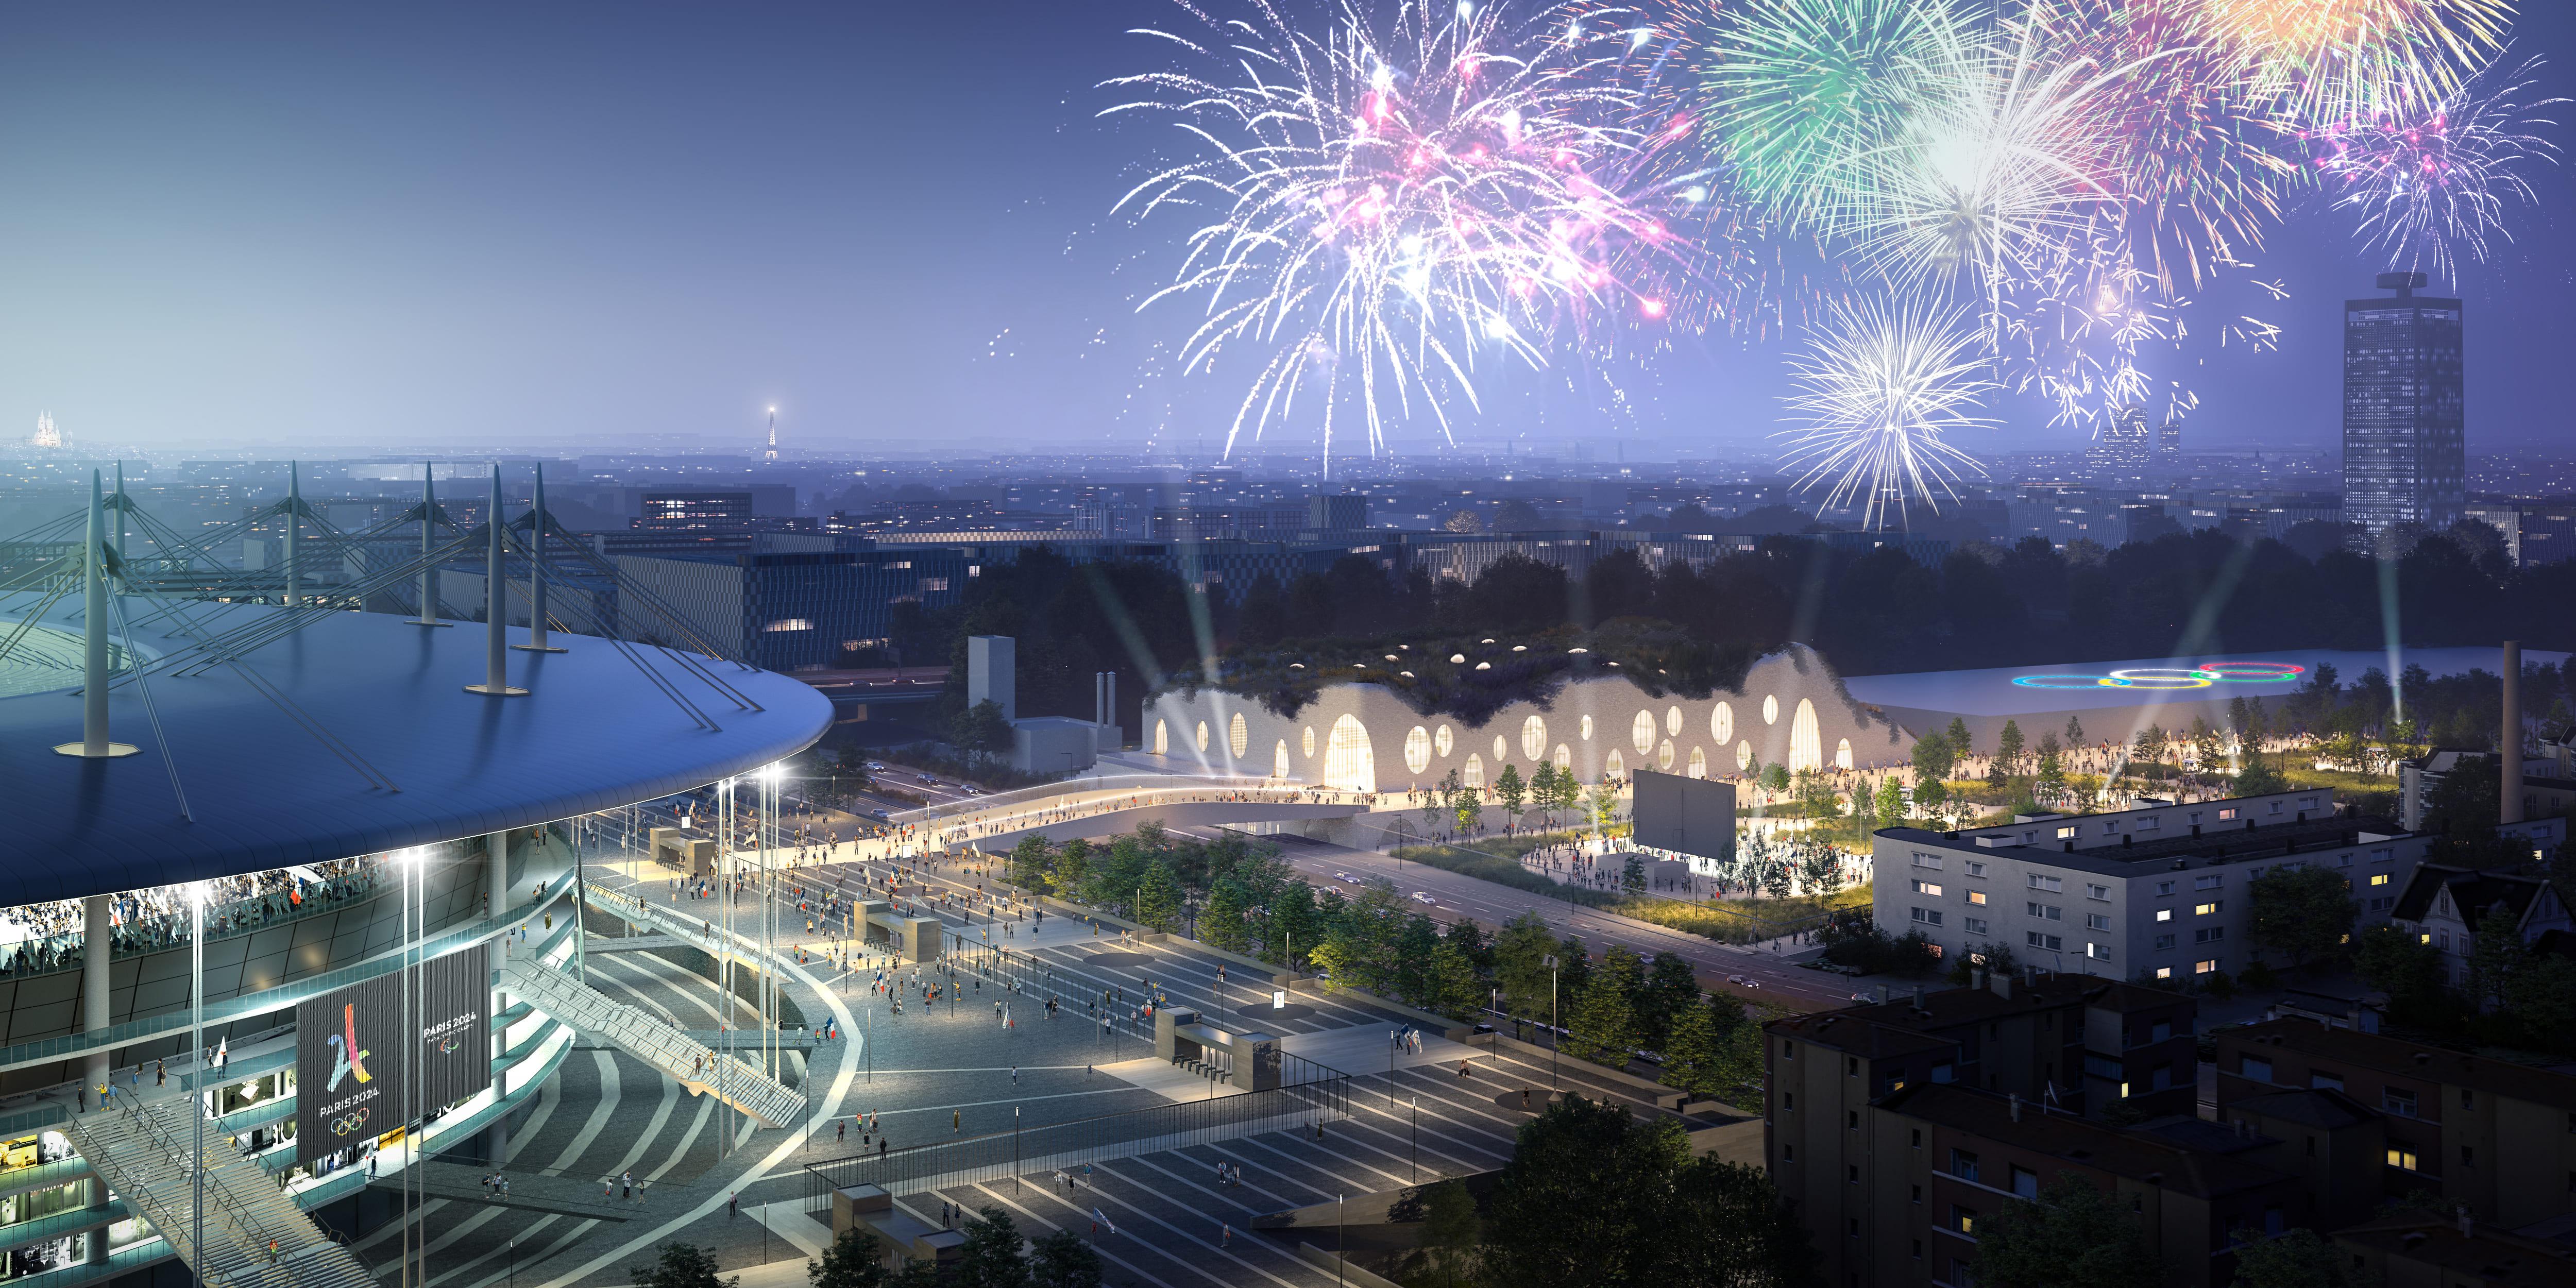 https://www.amc-archi.com/mediatheque/9/1/9/000059919/projet-non-retenu-centre-aquatique-olympique-jo.jpg